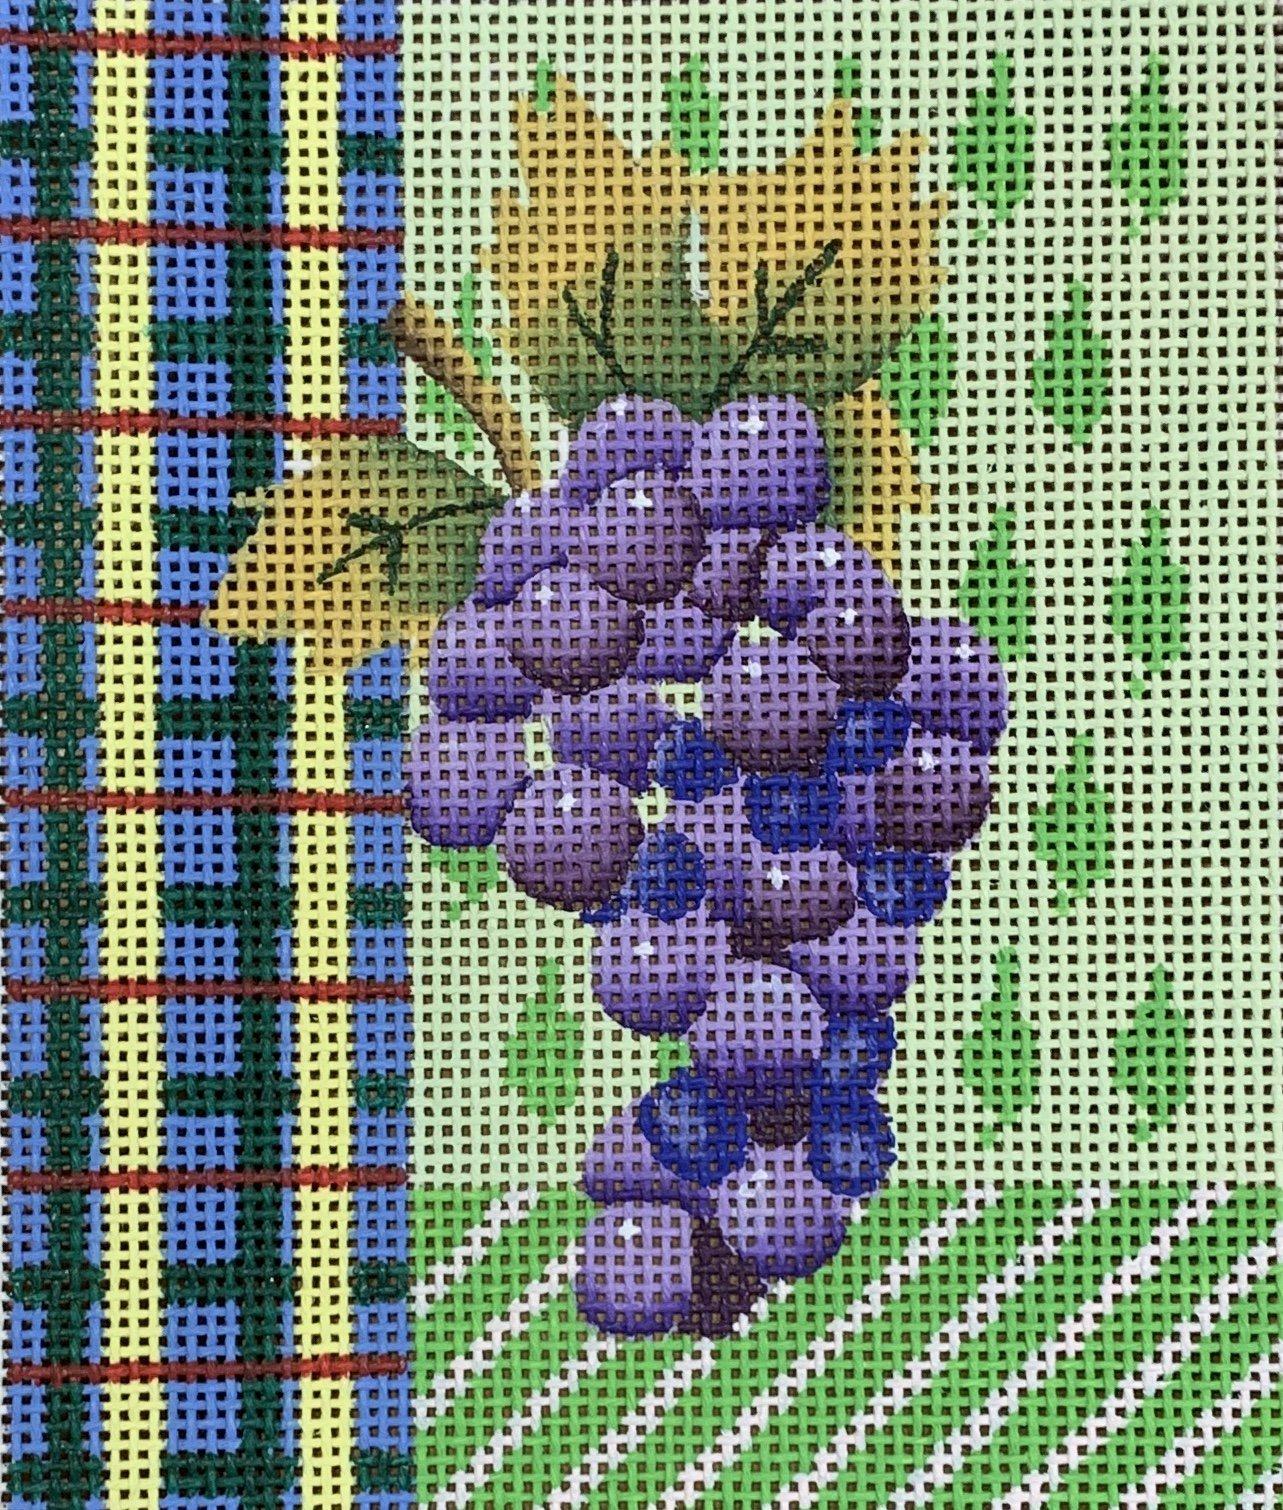 Festive Fruits - Grapes